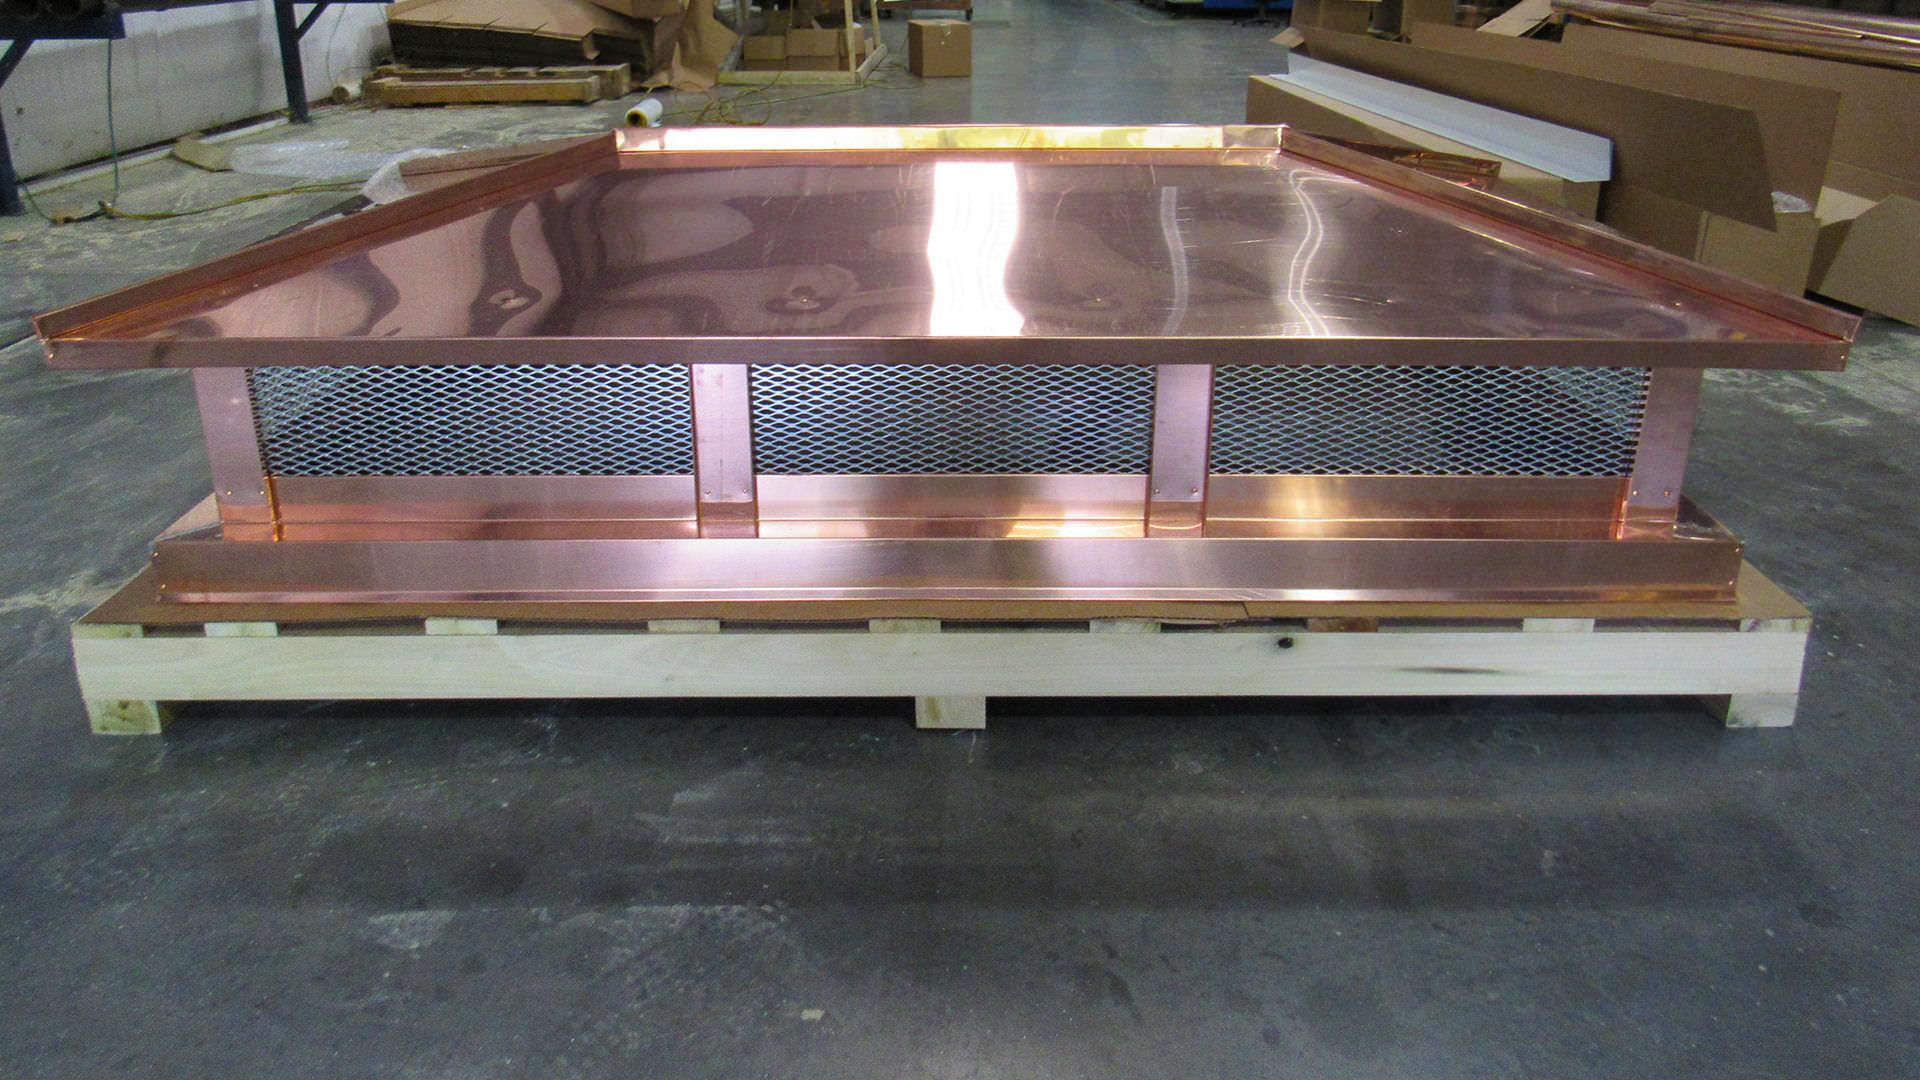 Hip roof copper multi flue chimney cap - shipping image